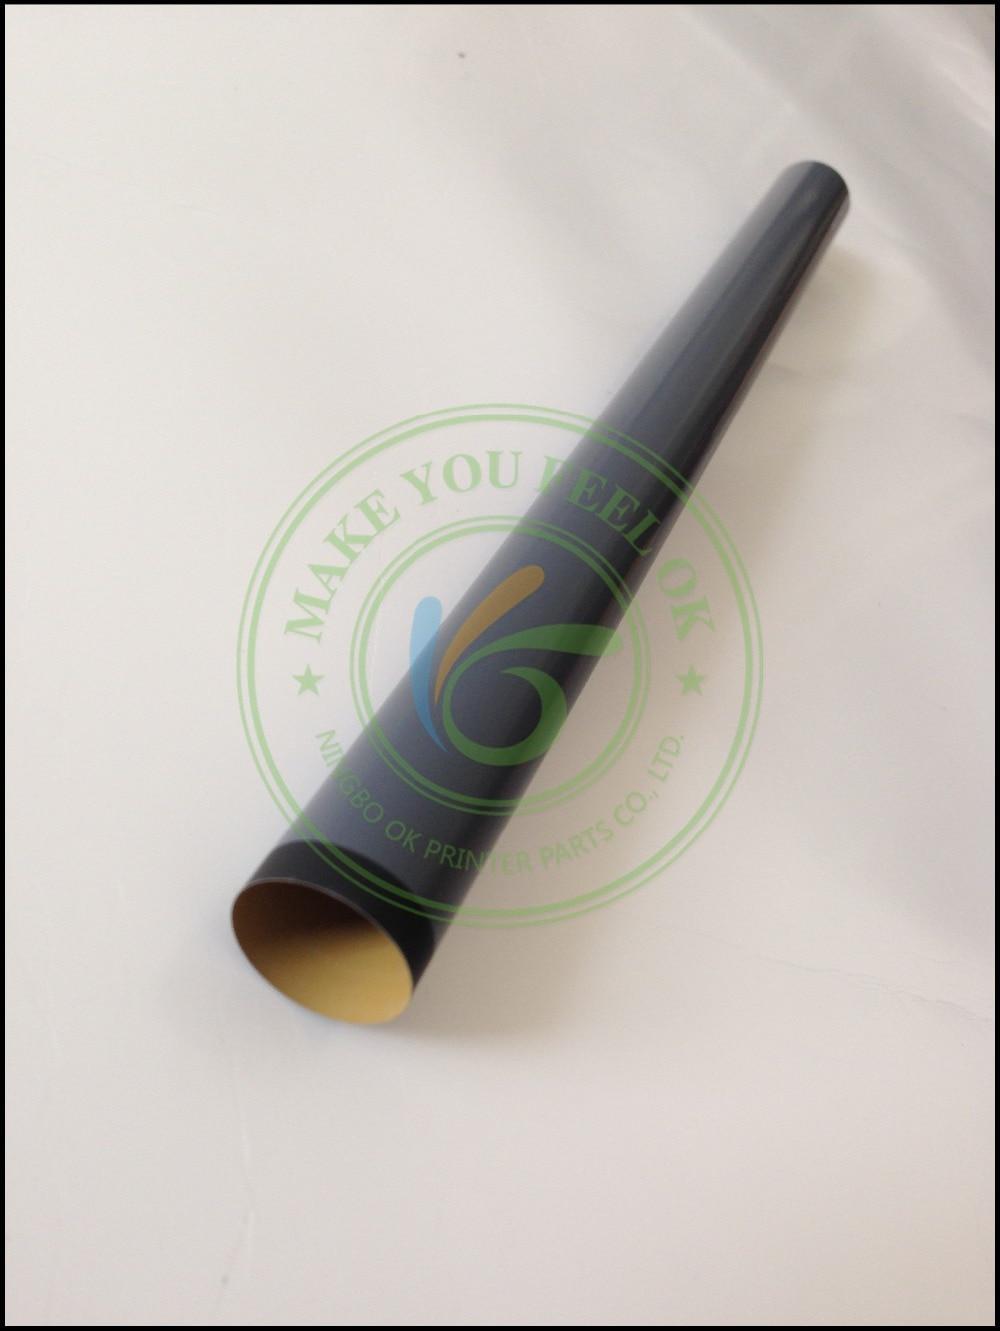 10X ORIGINAL HP 1000 1010 1012 1020 1102 1022 1160 1200 1320 Fuser Film Sleeve